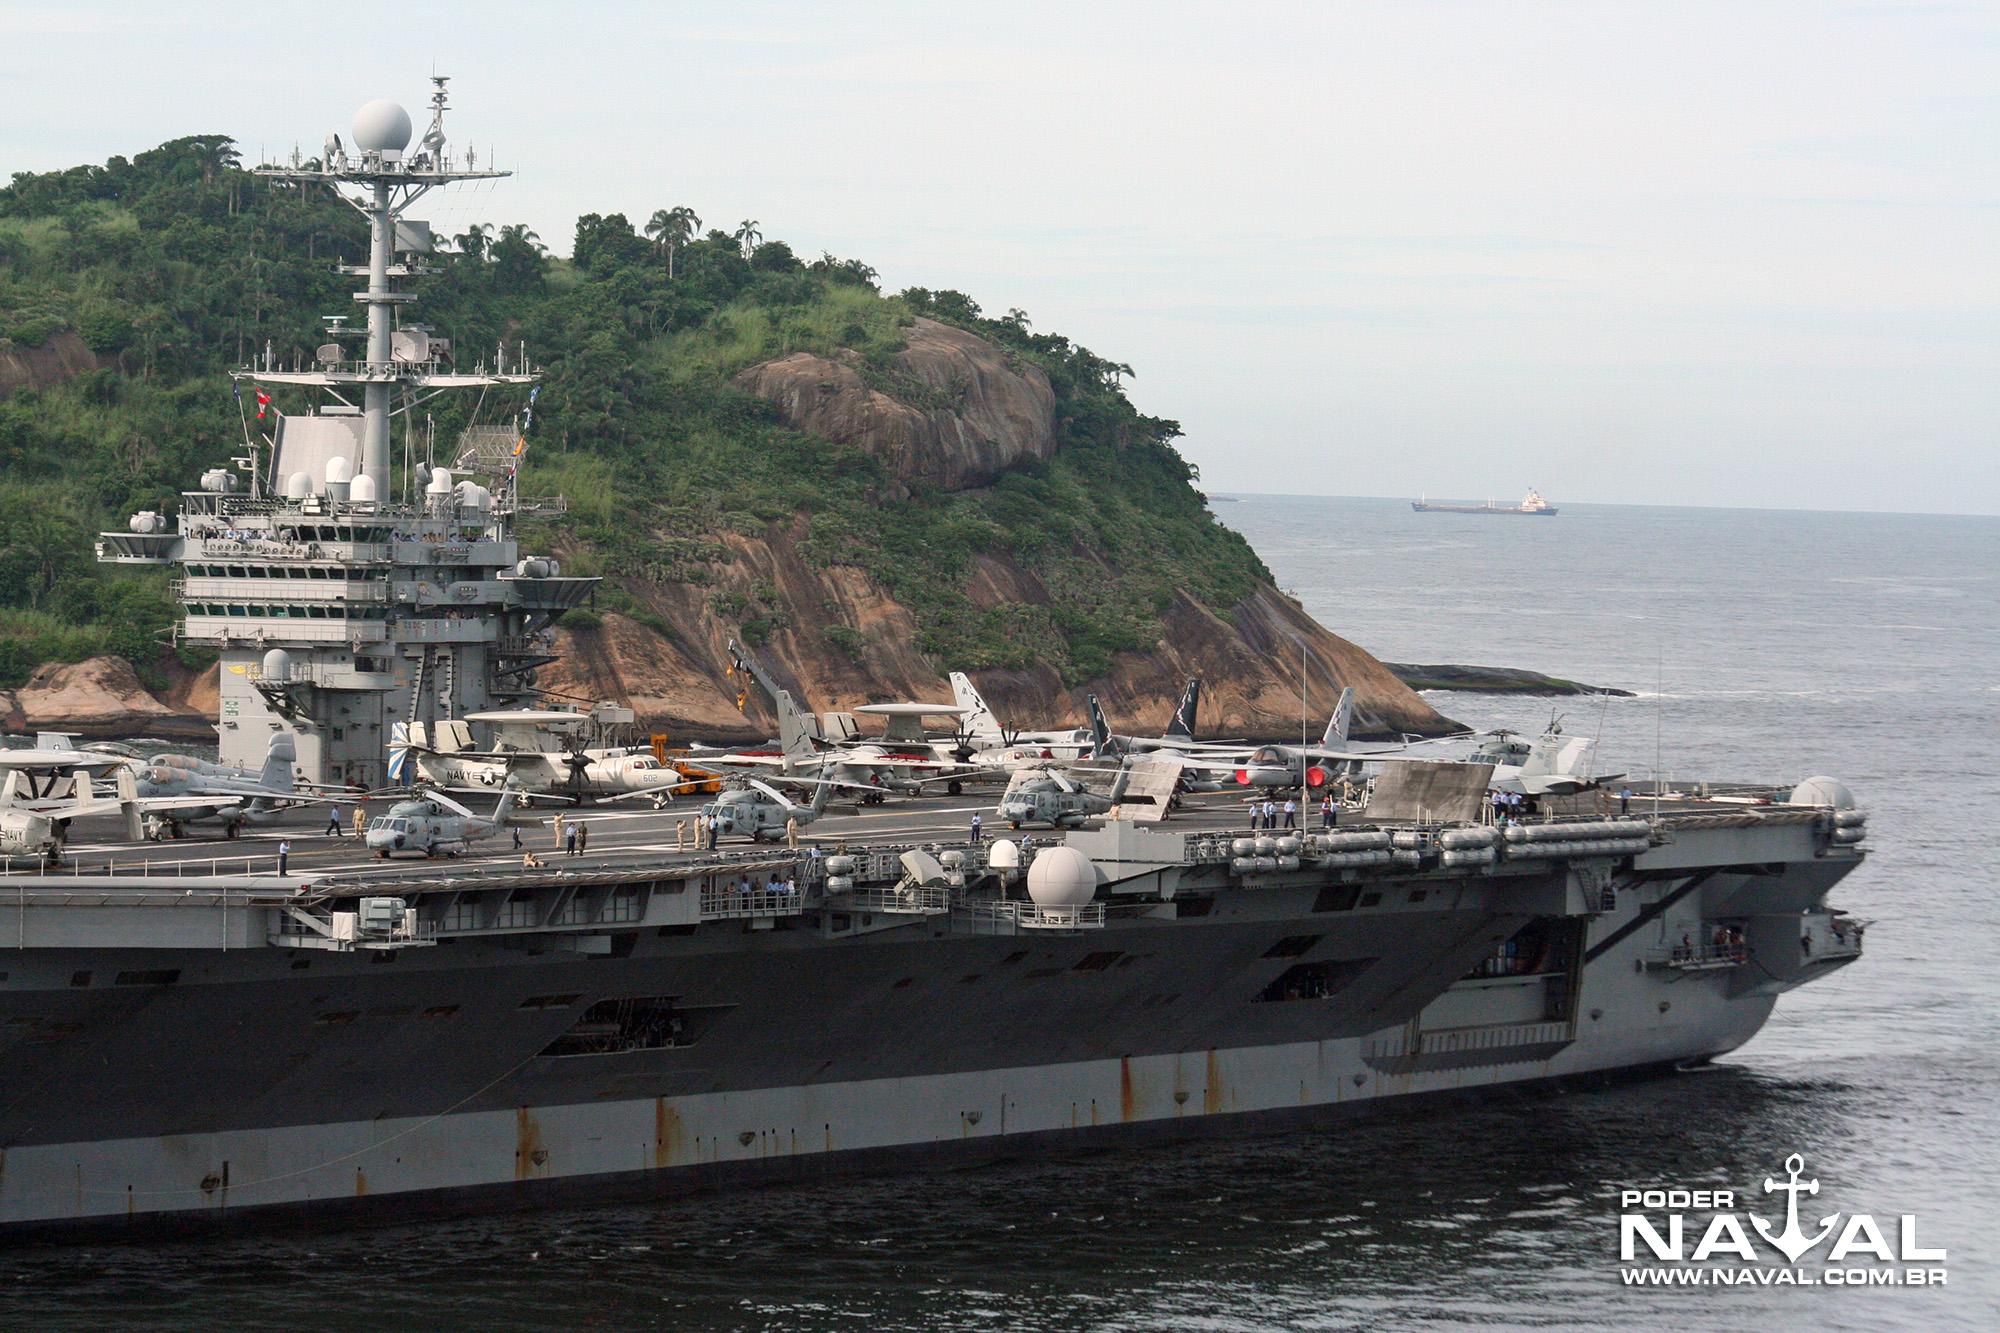 USS George Washington (CVN-73) no Rio - 2008 - 8a